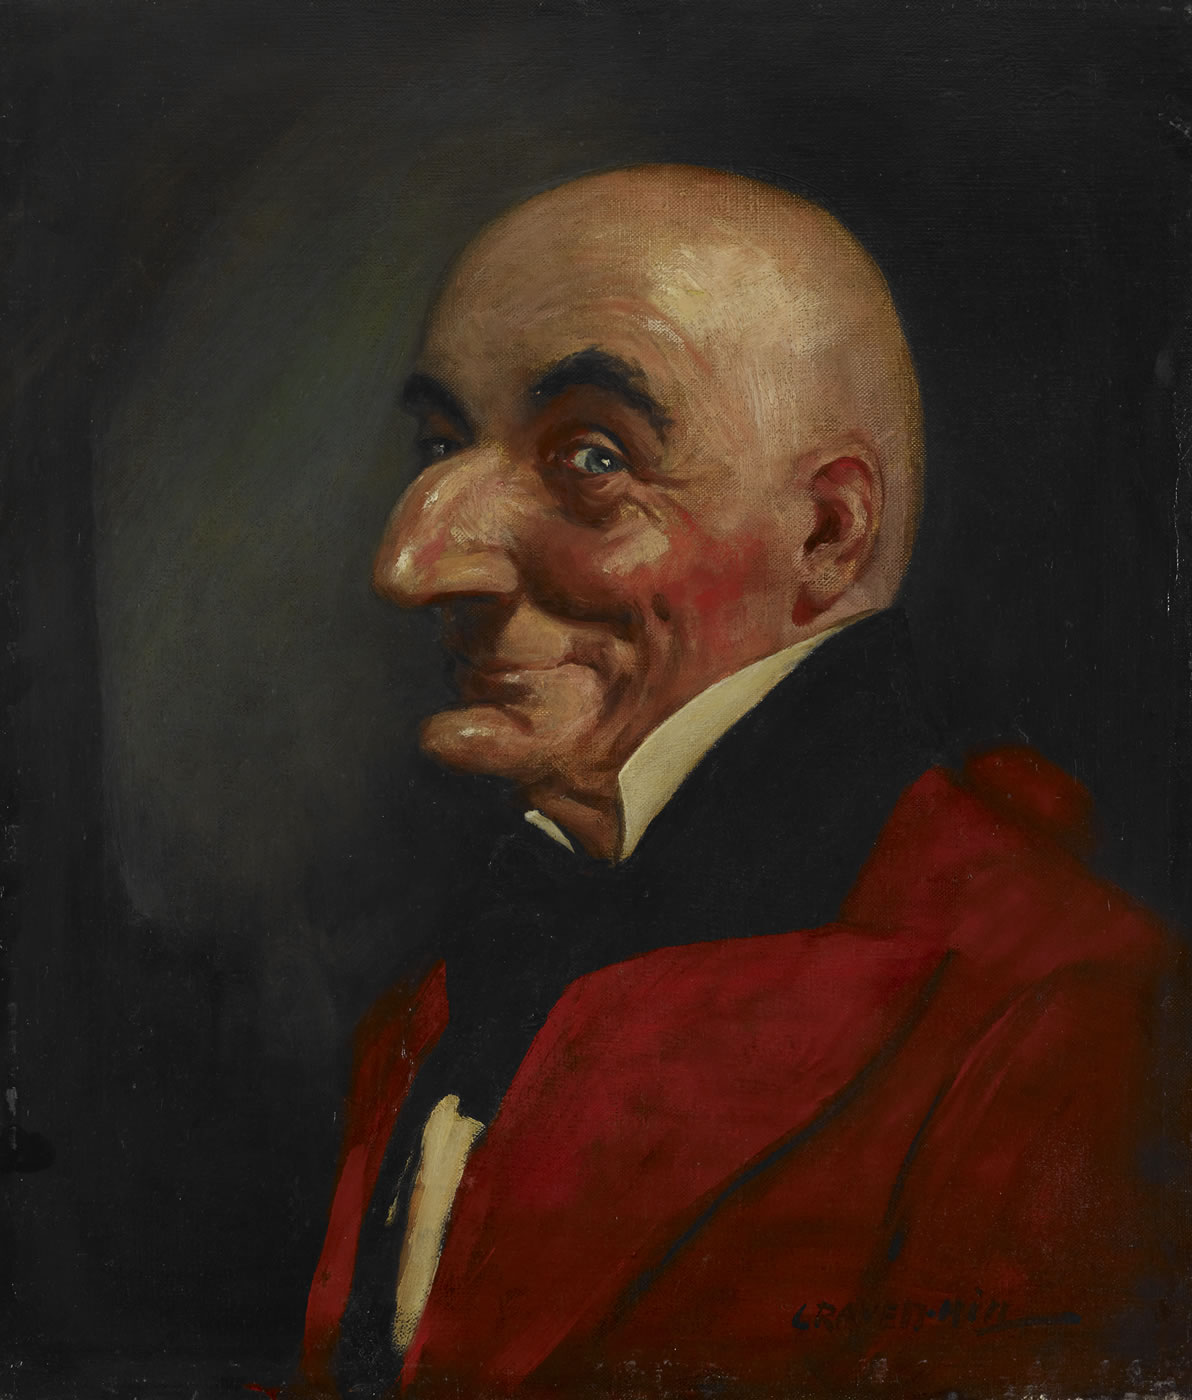 Mr Punch, Leonard Raven-Hill, early 20th century